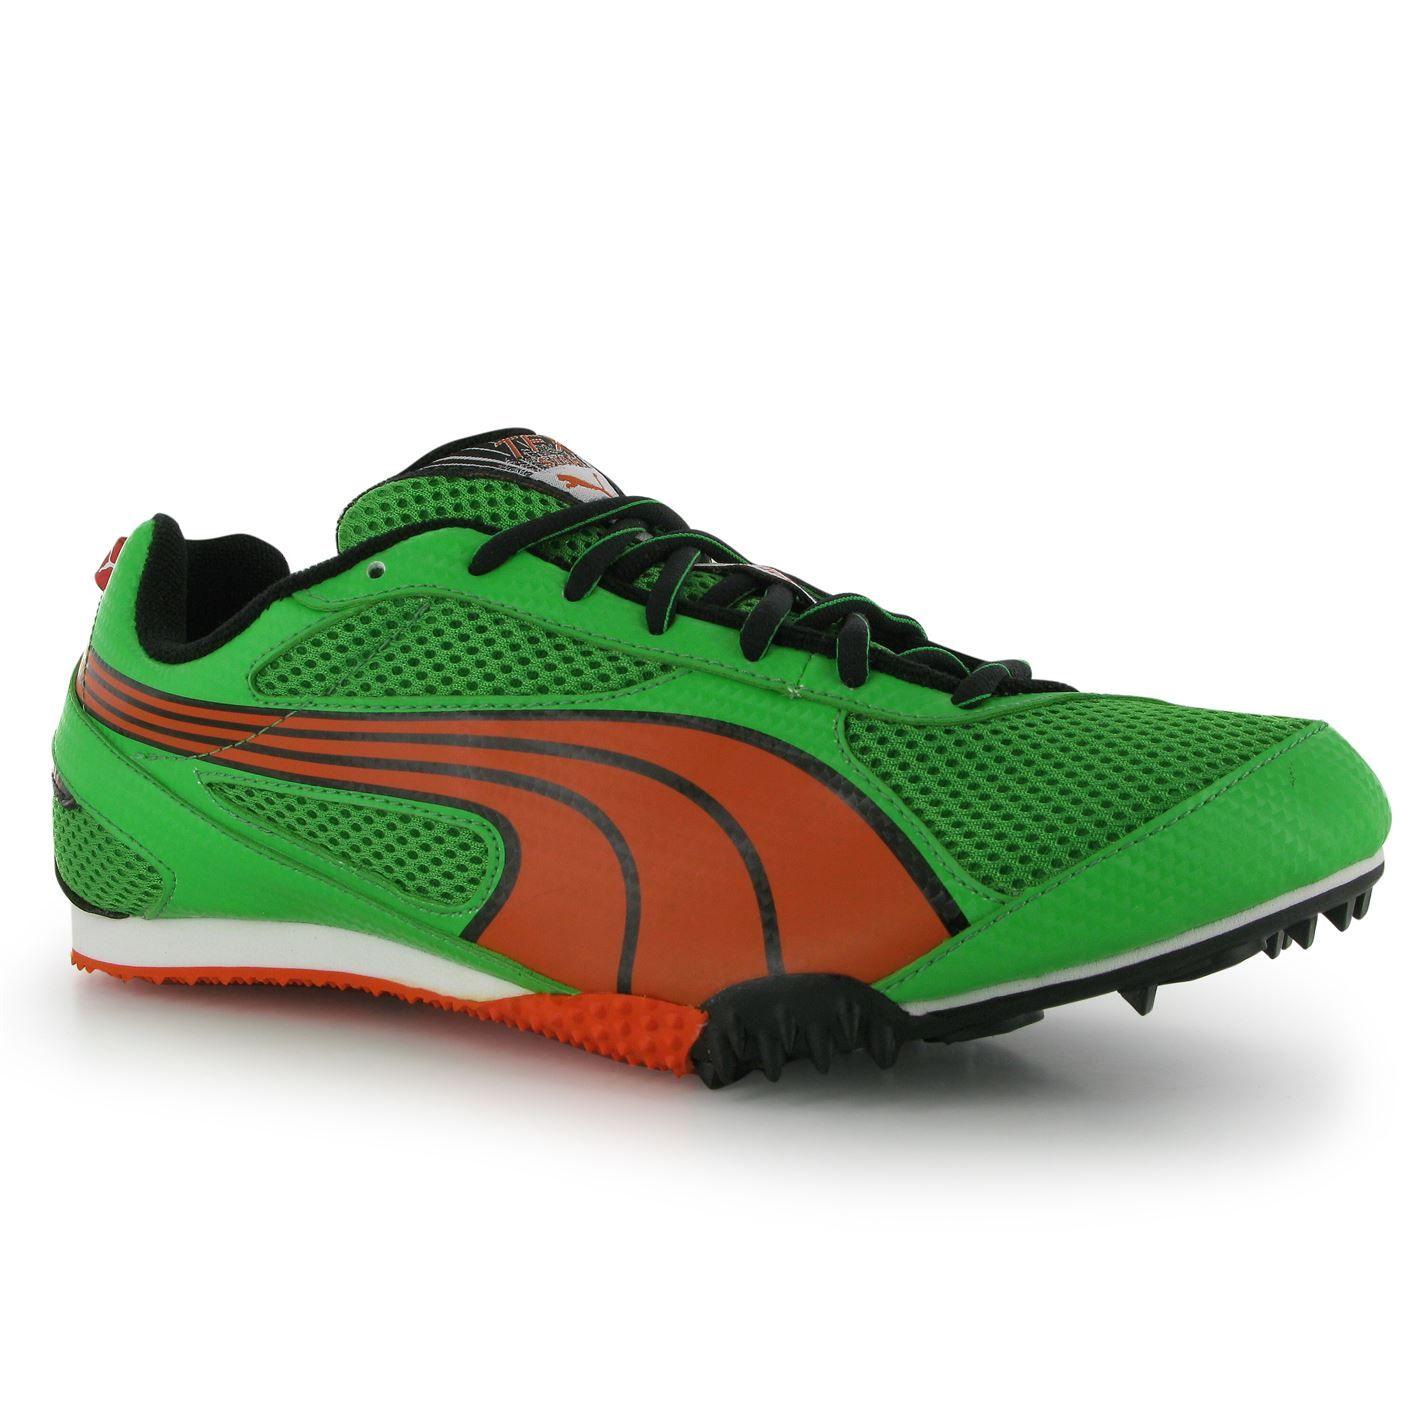 d8ca5d462f8 Puma Complete TFX Star Mens Running Spikes  u003e u003e Now  20  running